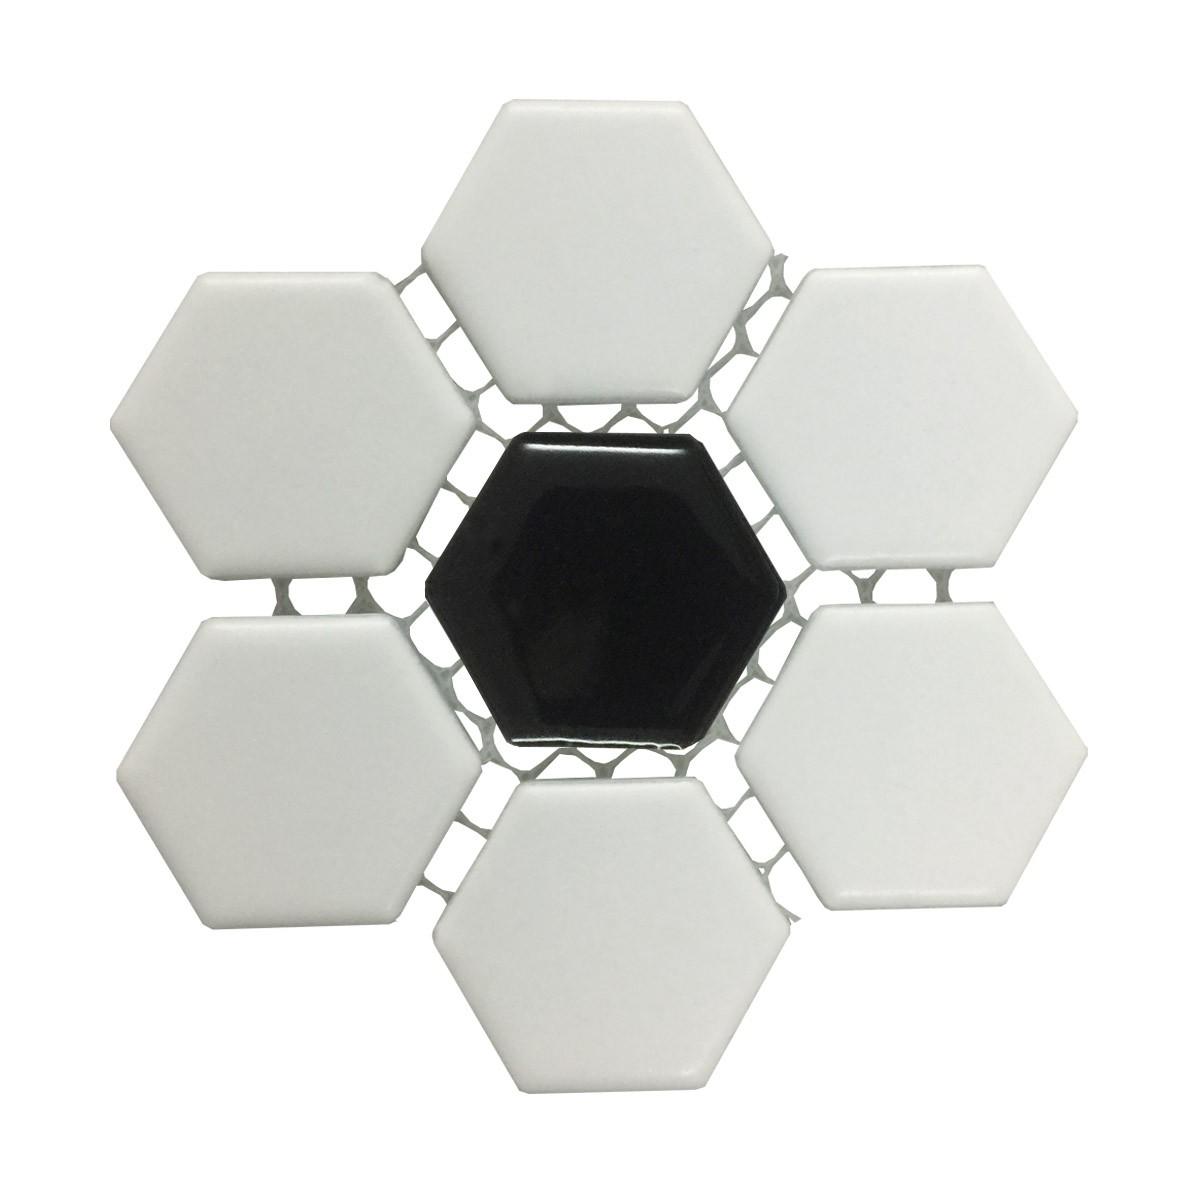 Black and White Mosaic Hexagon Floor Wall Tile 23 Sheet 10.25 x 11.8 19.3 SQFT Floor Tiles Mosaic Wall Tiles Mosaic Wall Tiles Ceramic